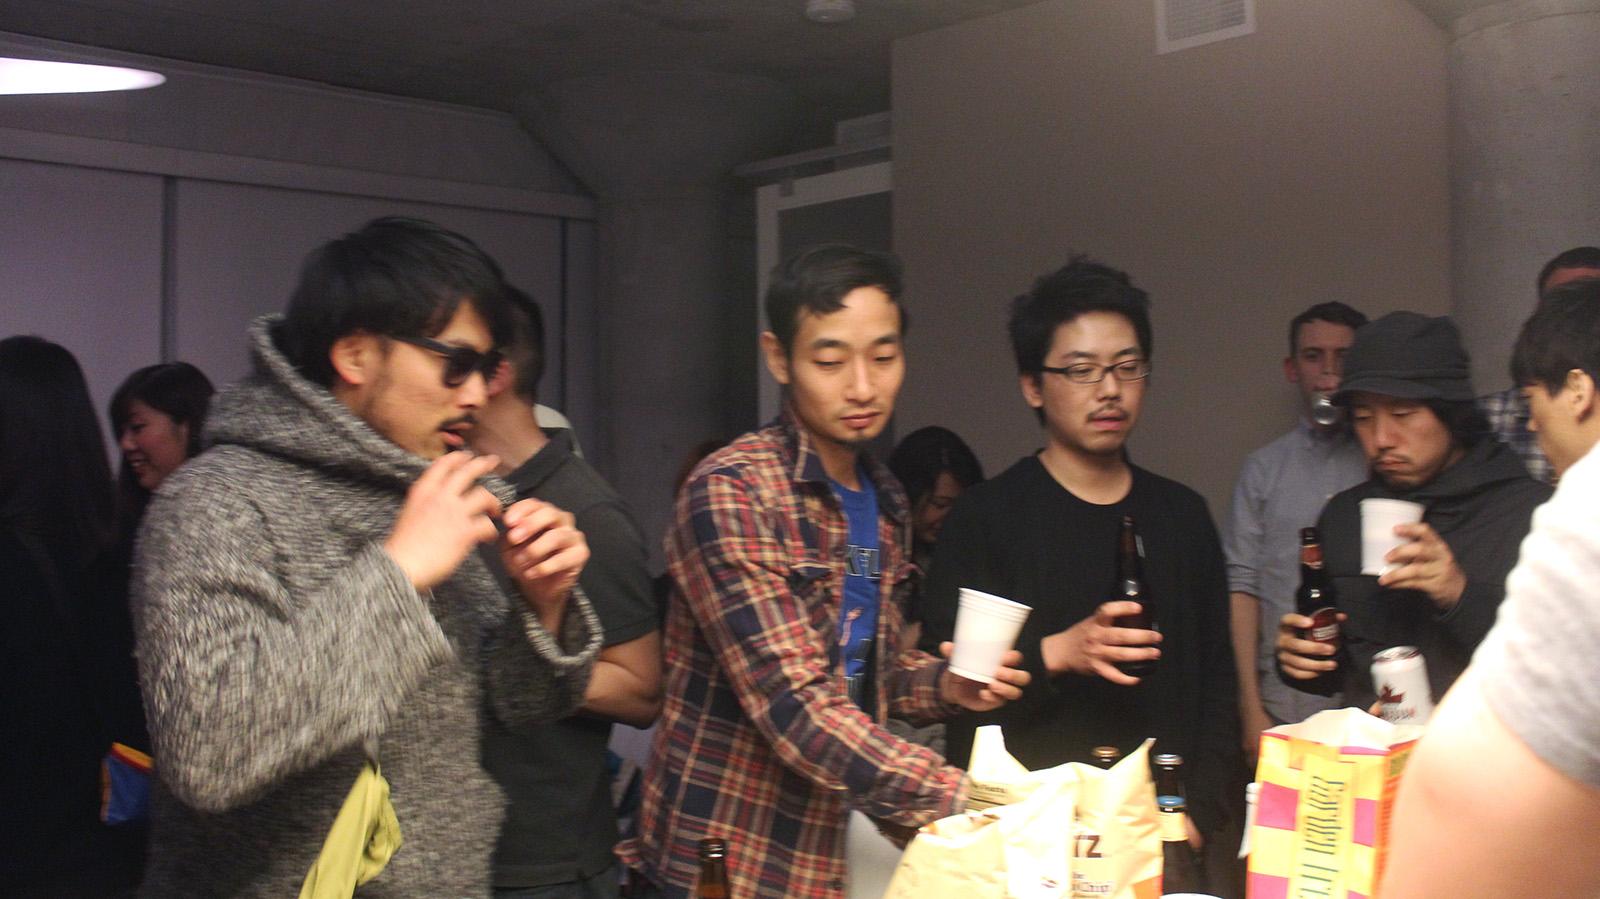 motk house party